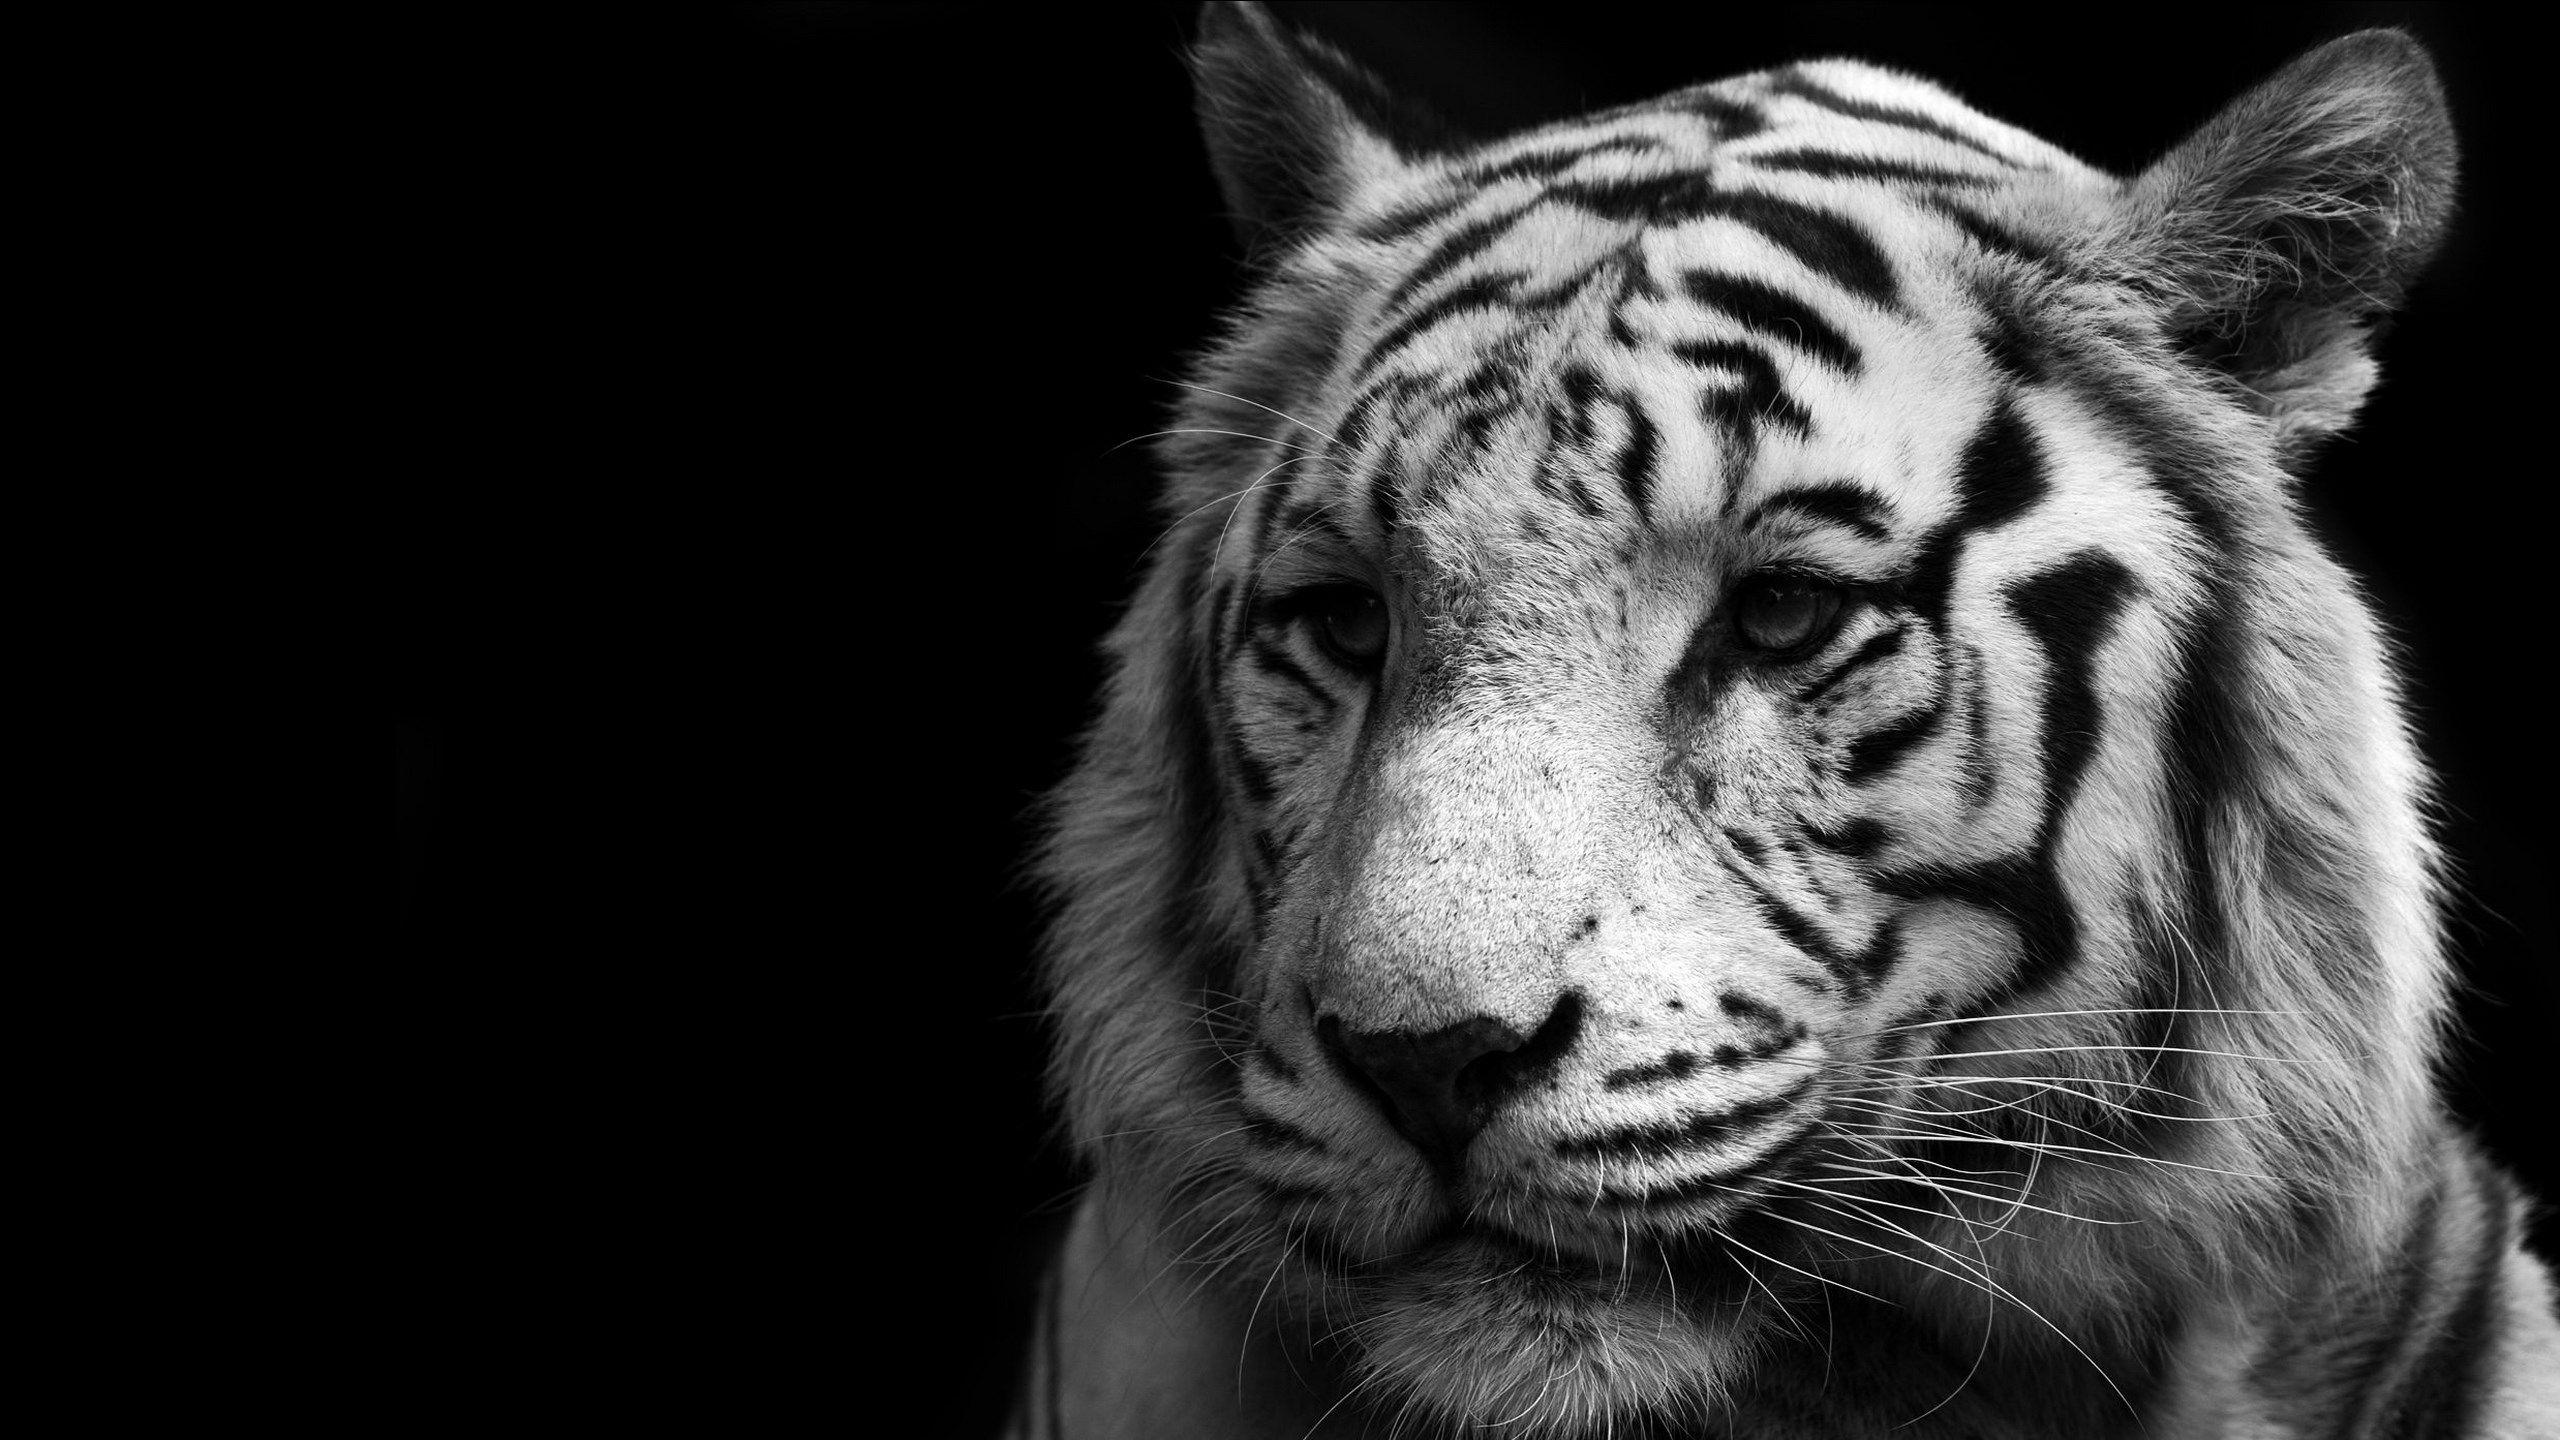 white tiger face image hd nature | ololoshenka | pinterest | black